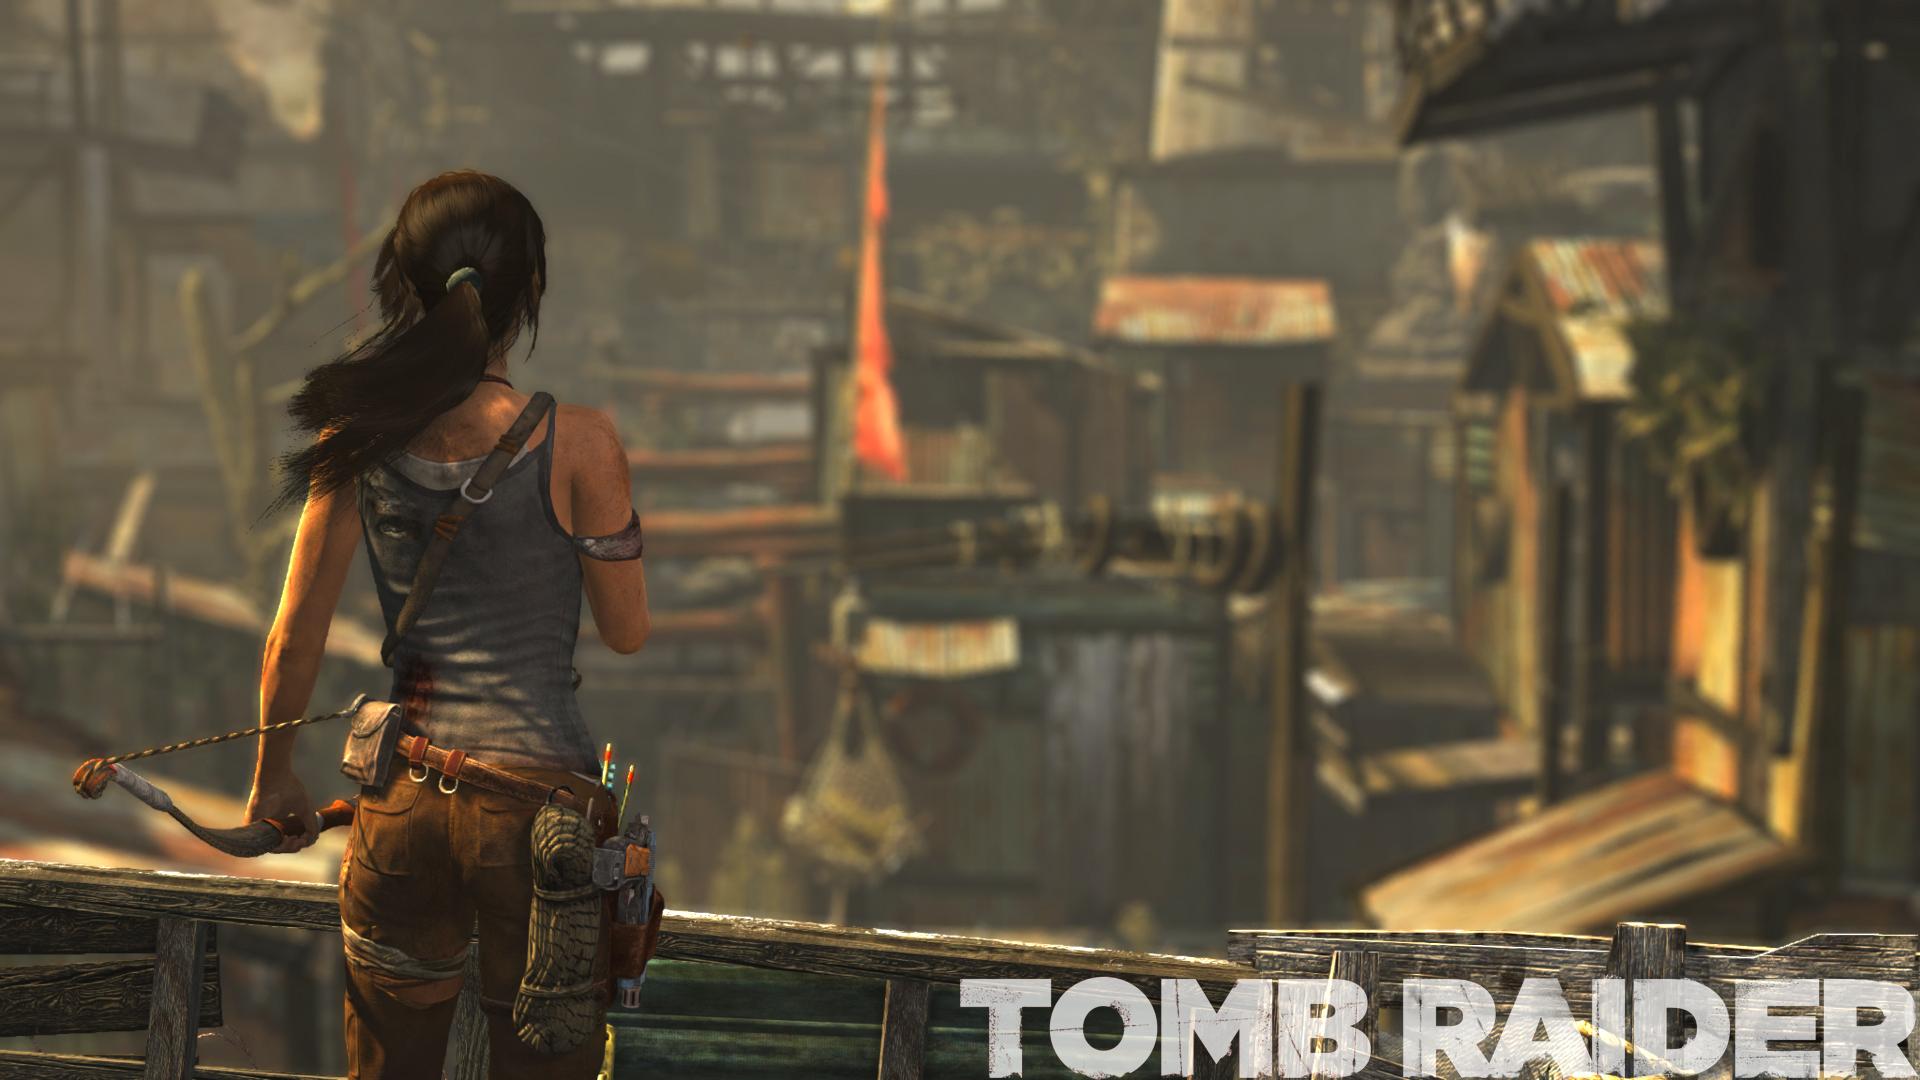 Pin By Knight On Fantasy Infatuation Tomb Raider Game Tomb Raider Raiders